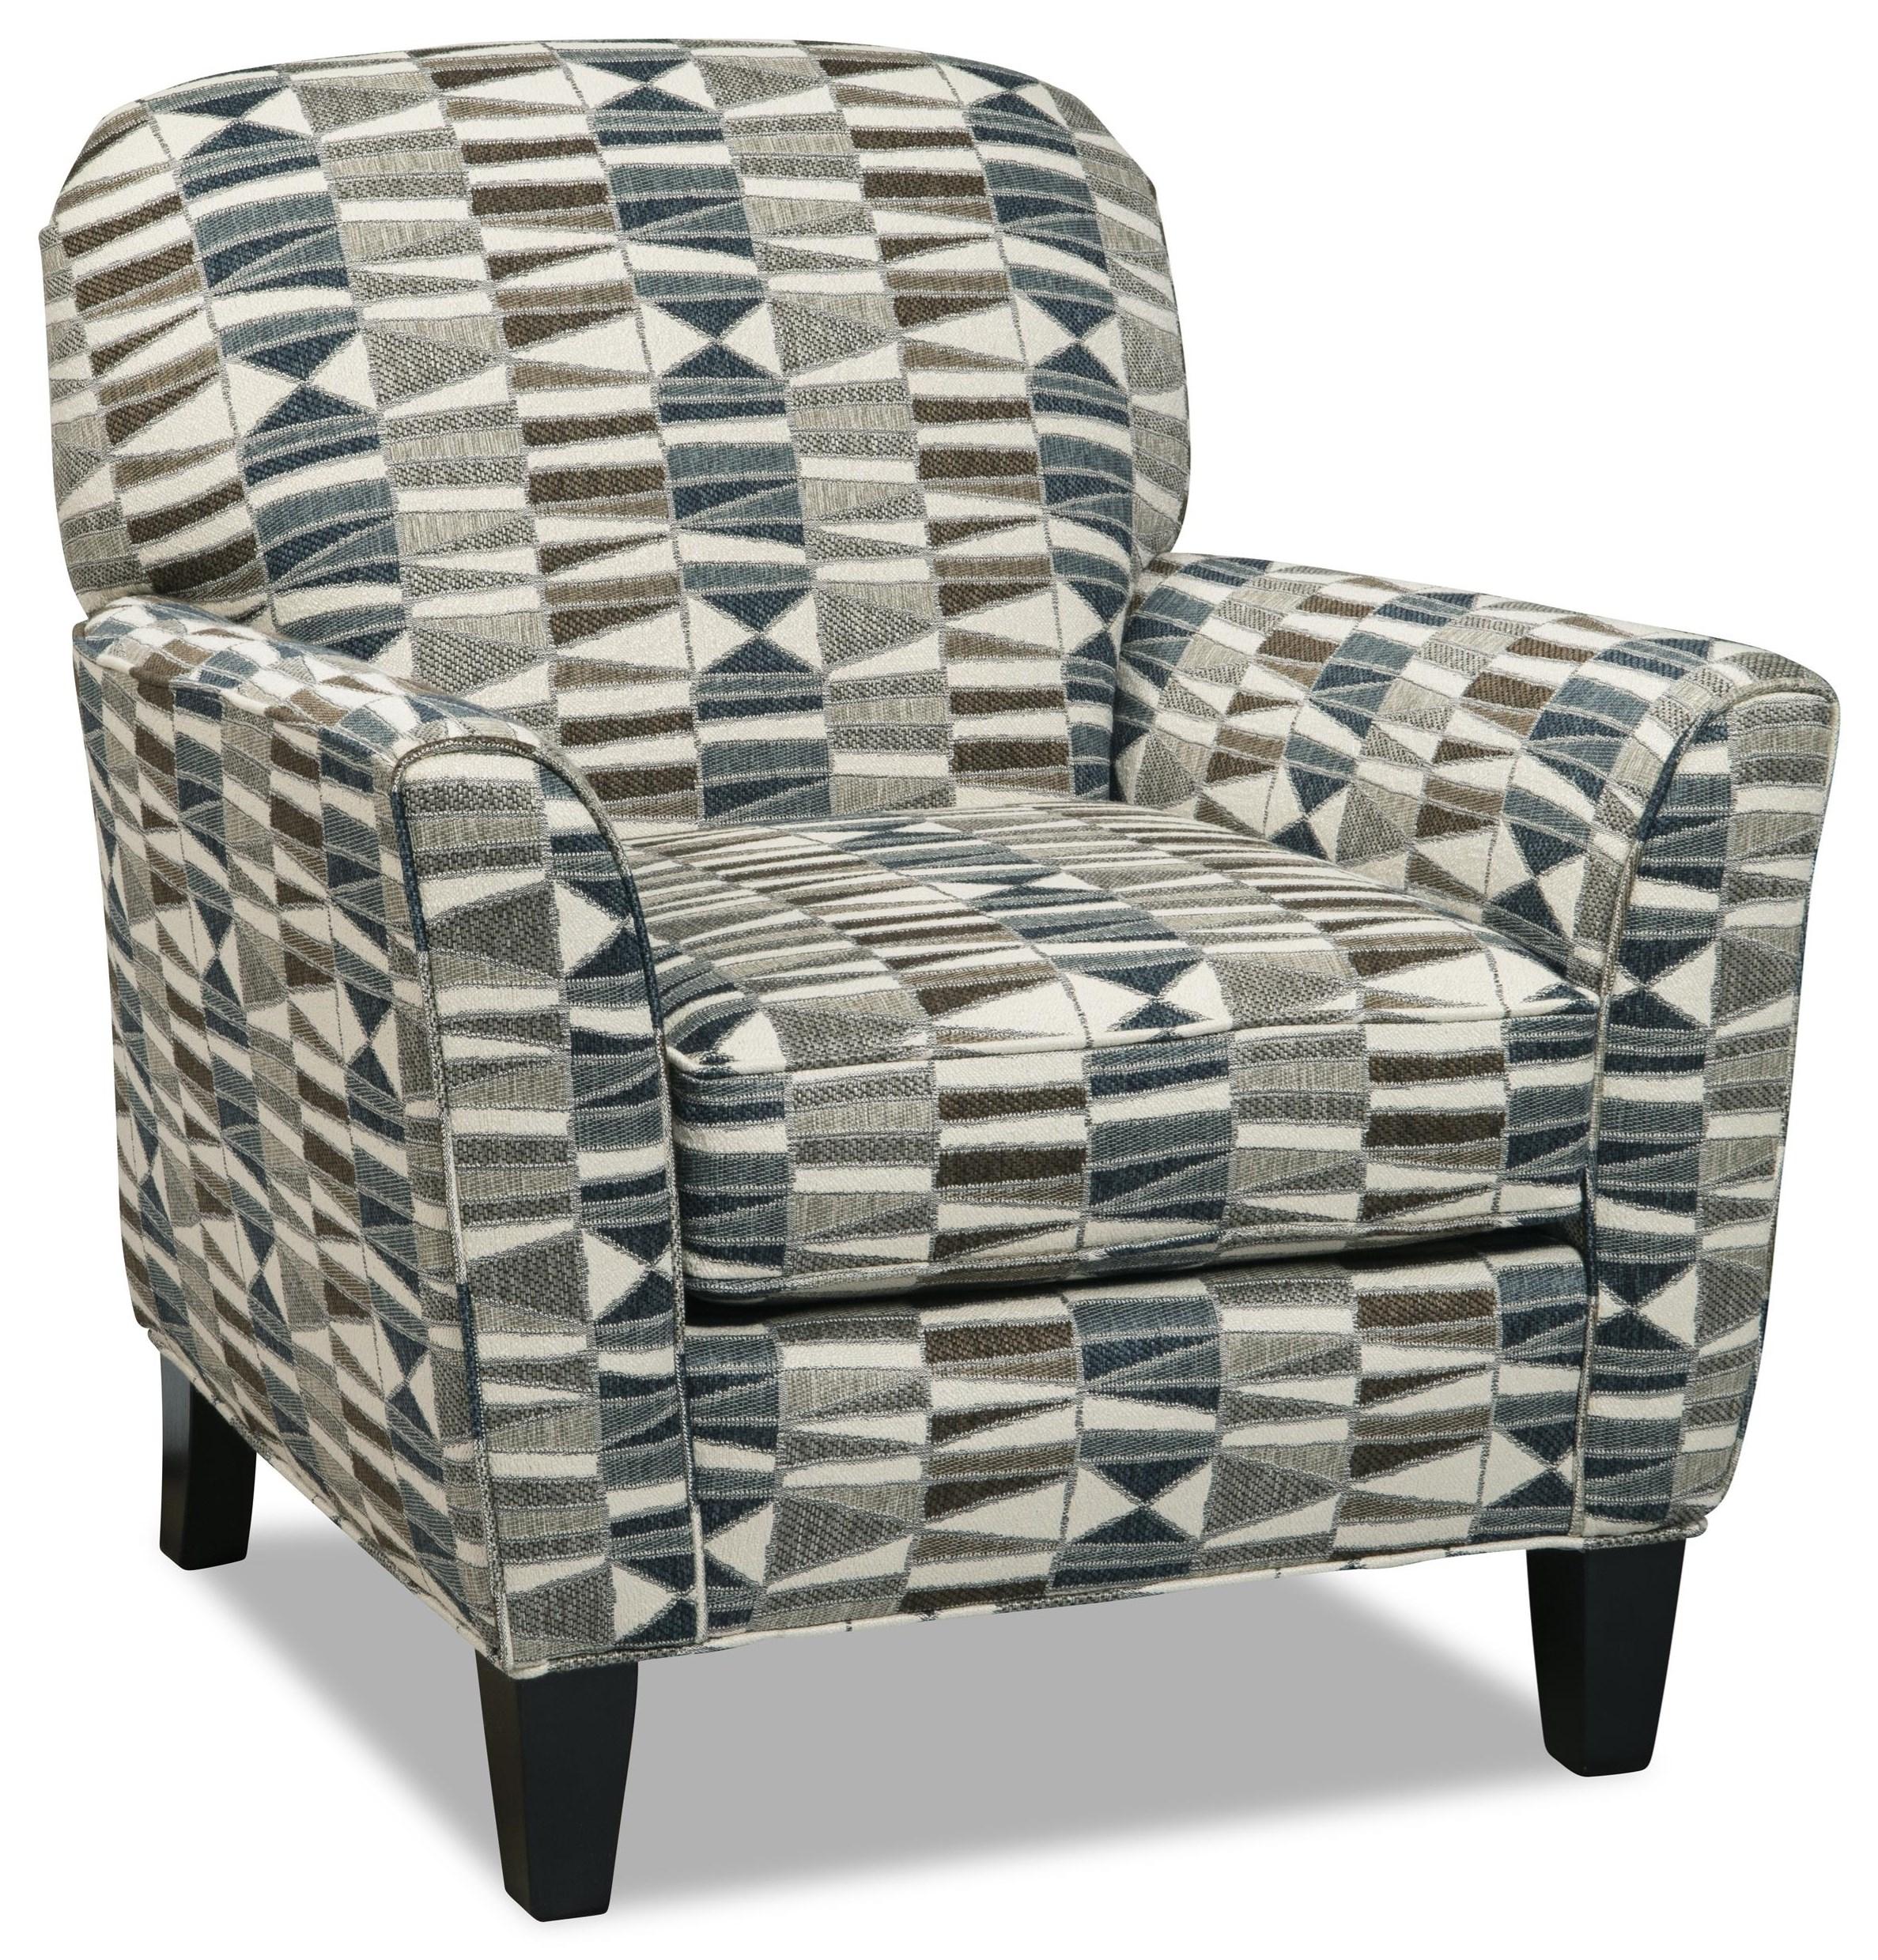 356 Docks Dd Docks Chair by Trendline at Stoney Creek Furniture